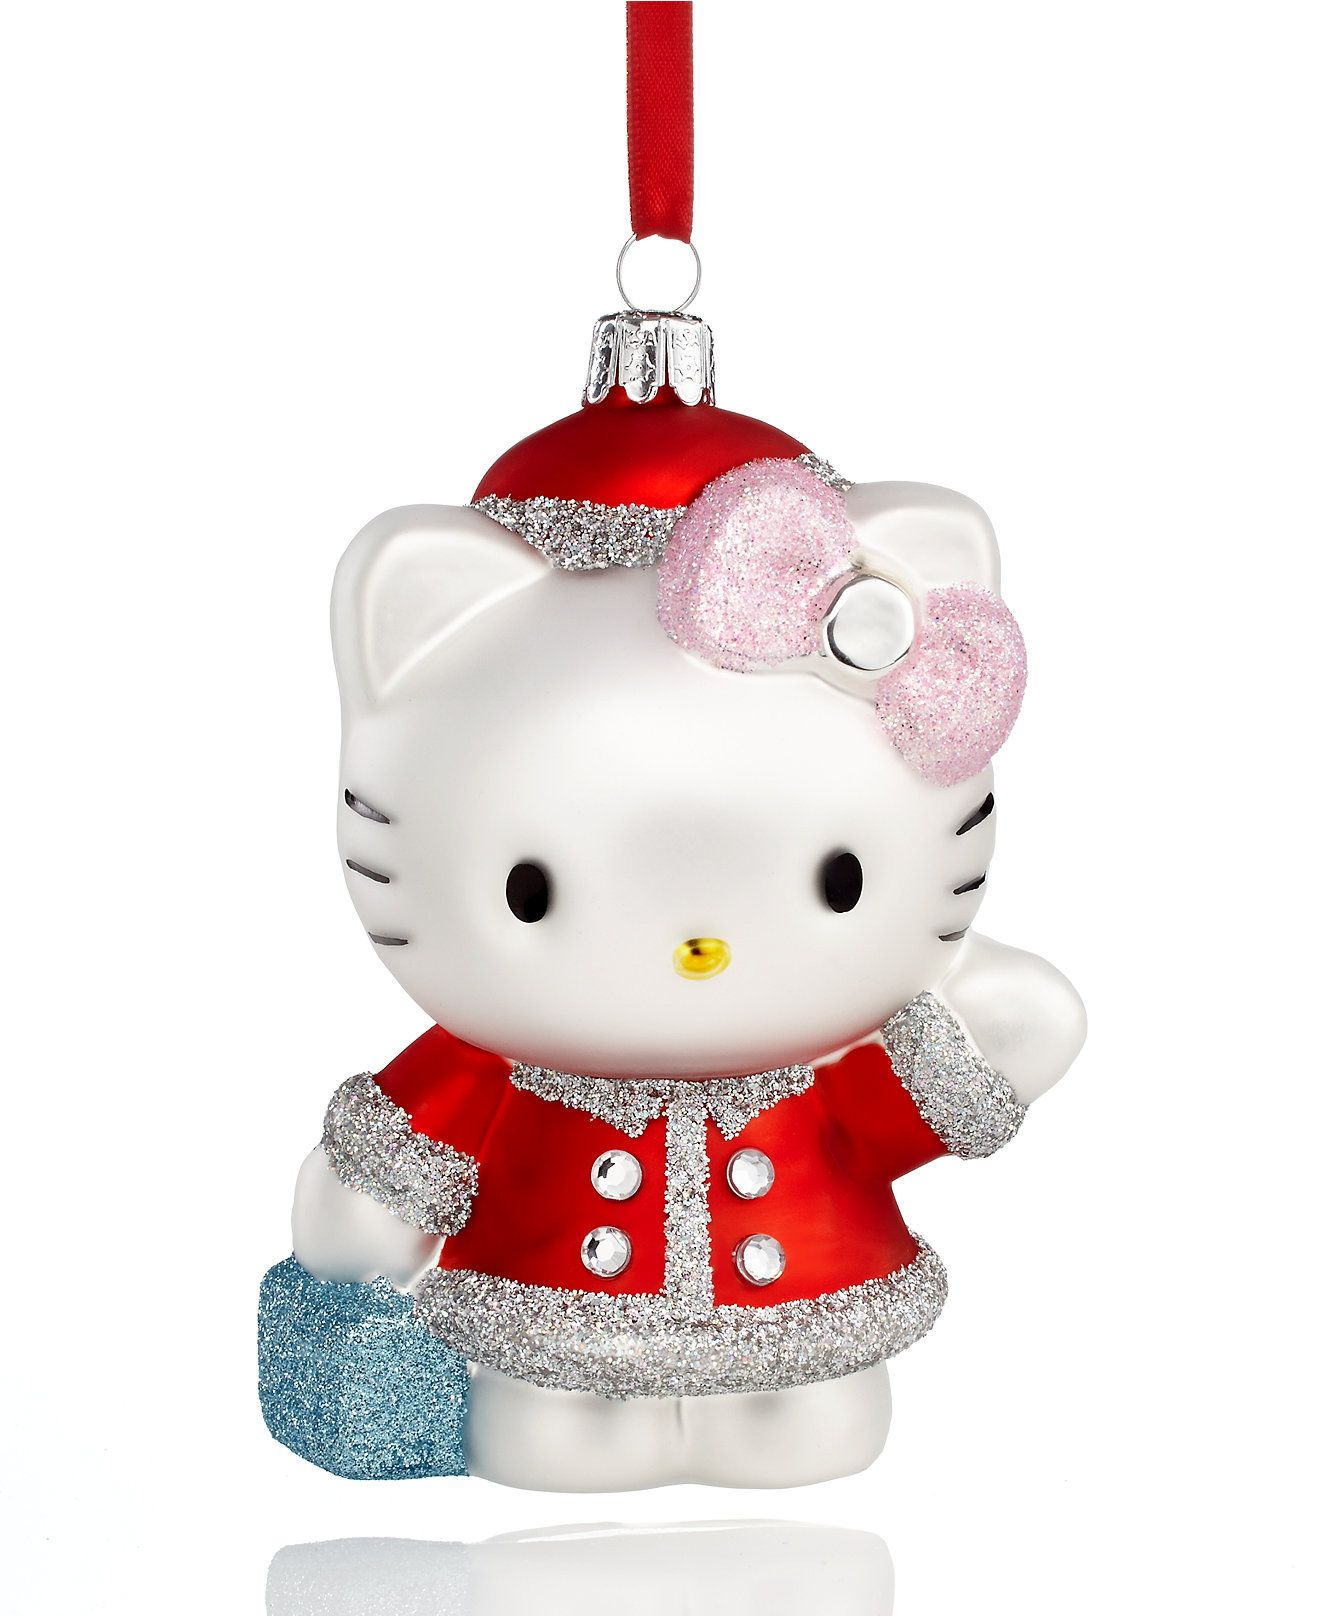 Kurt Adler Hello Kitty Ornament Christmas Ornaments